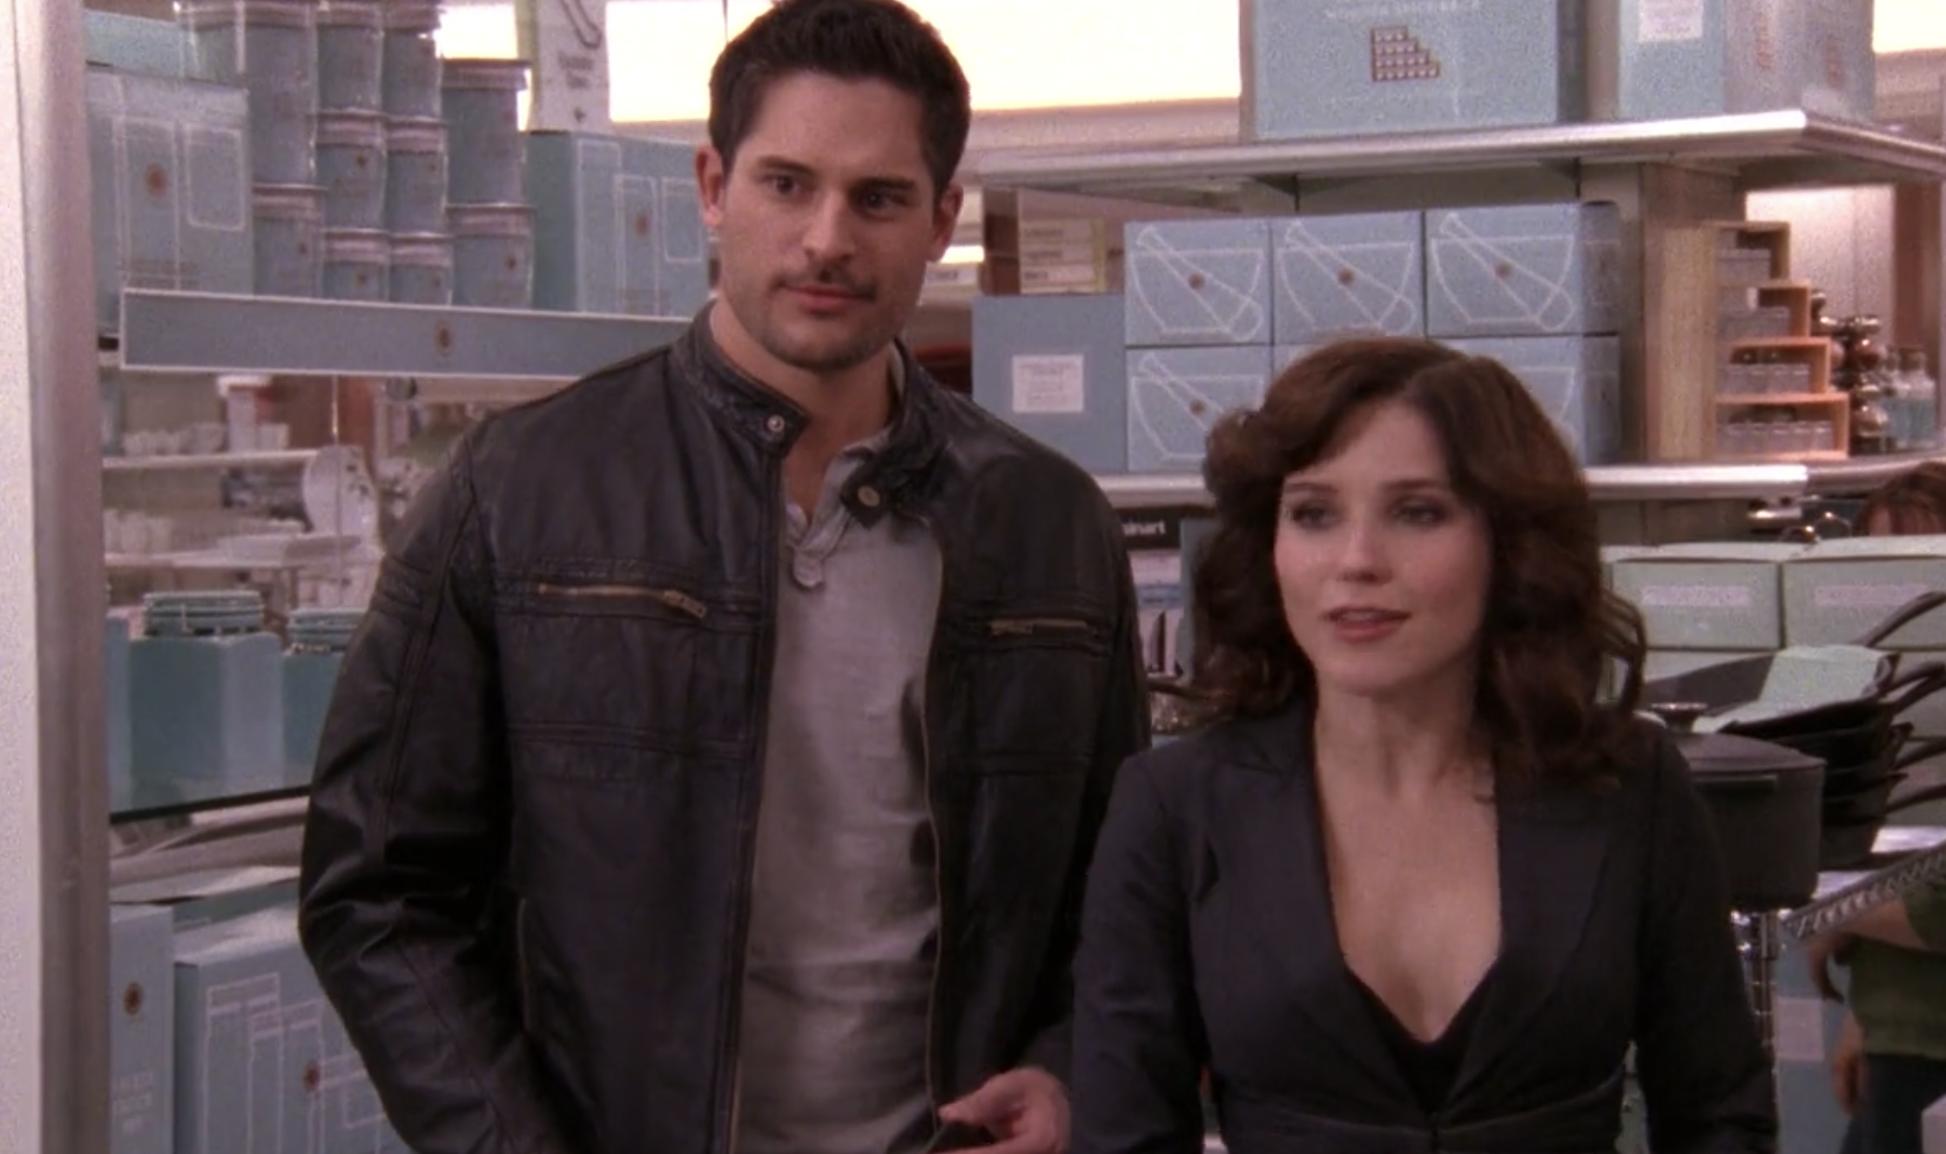 Owen and Brooke at Macy's